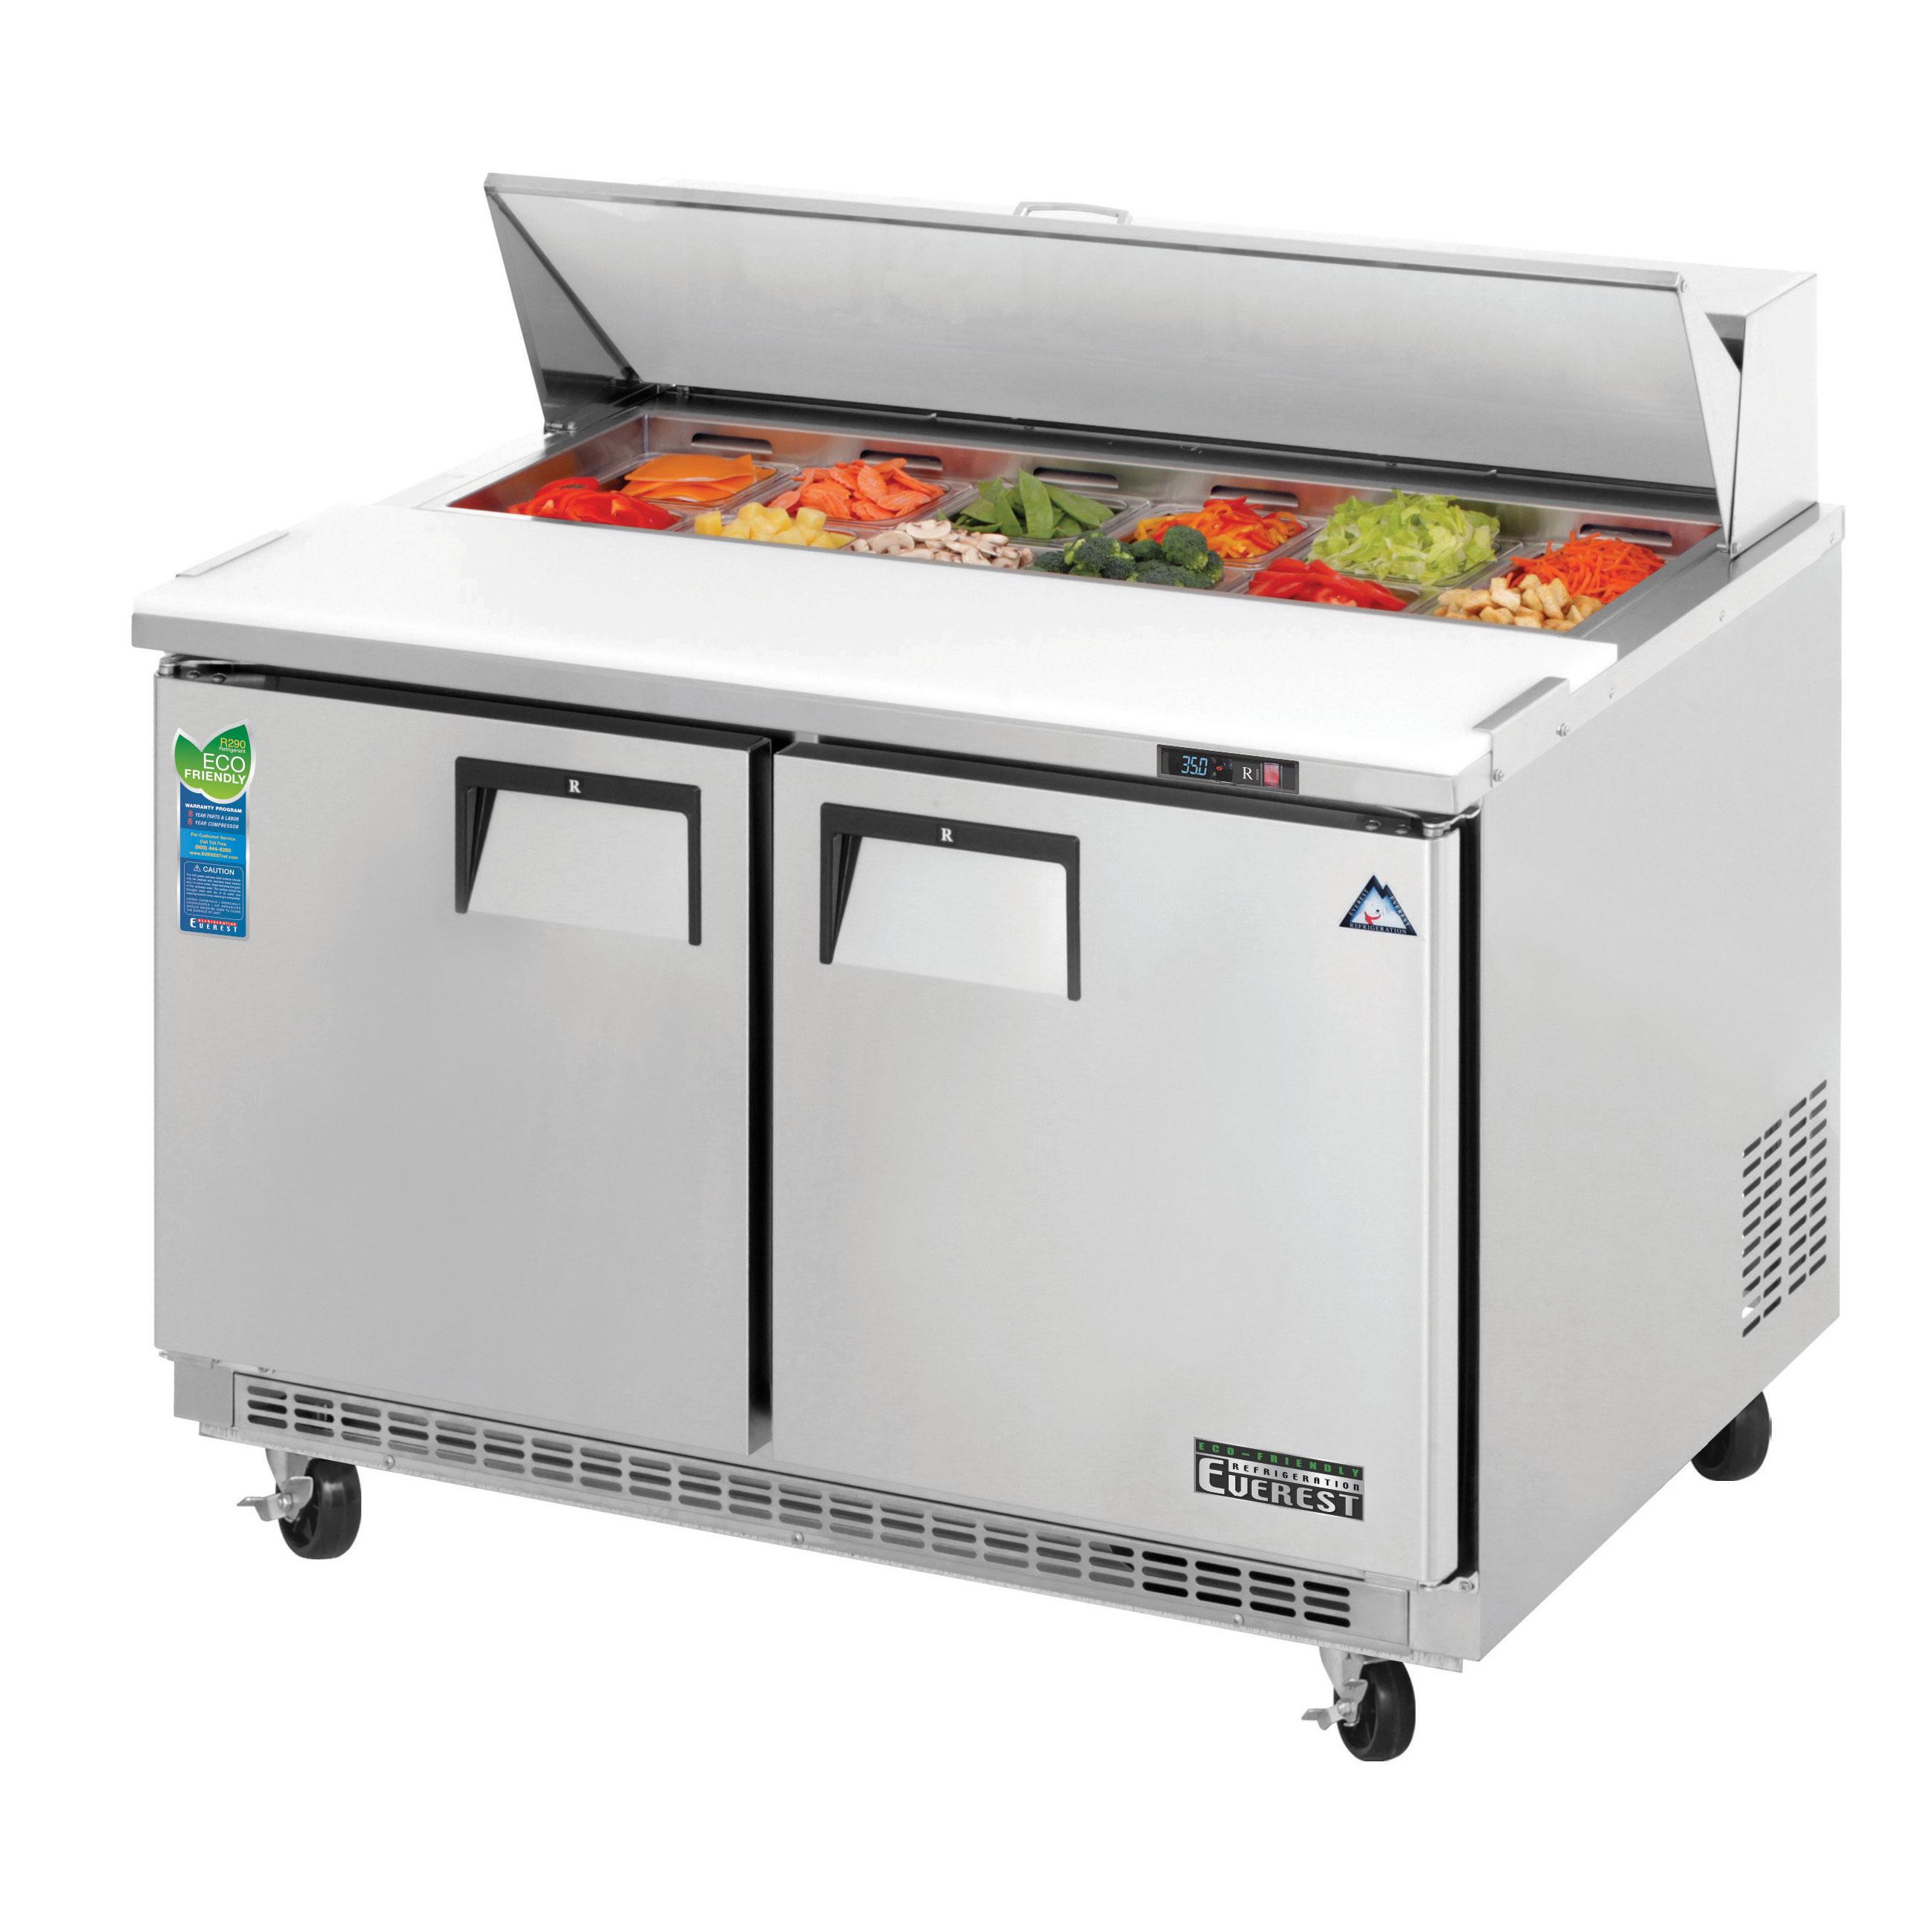 Everest Refrigeration EPBNR2 refrigerated counter, sandwich / salad unit